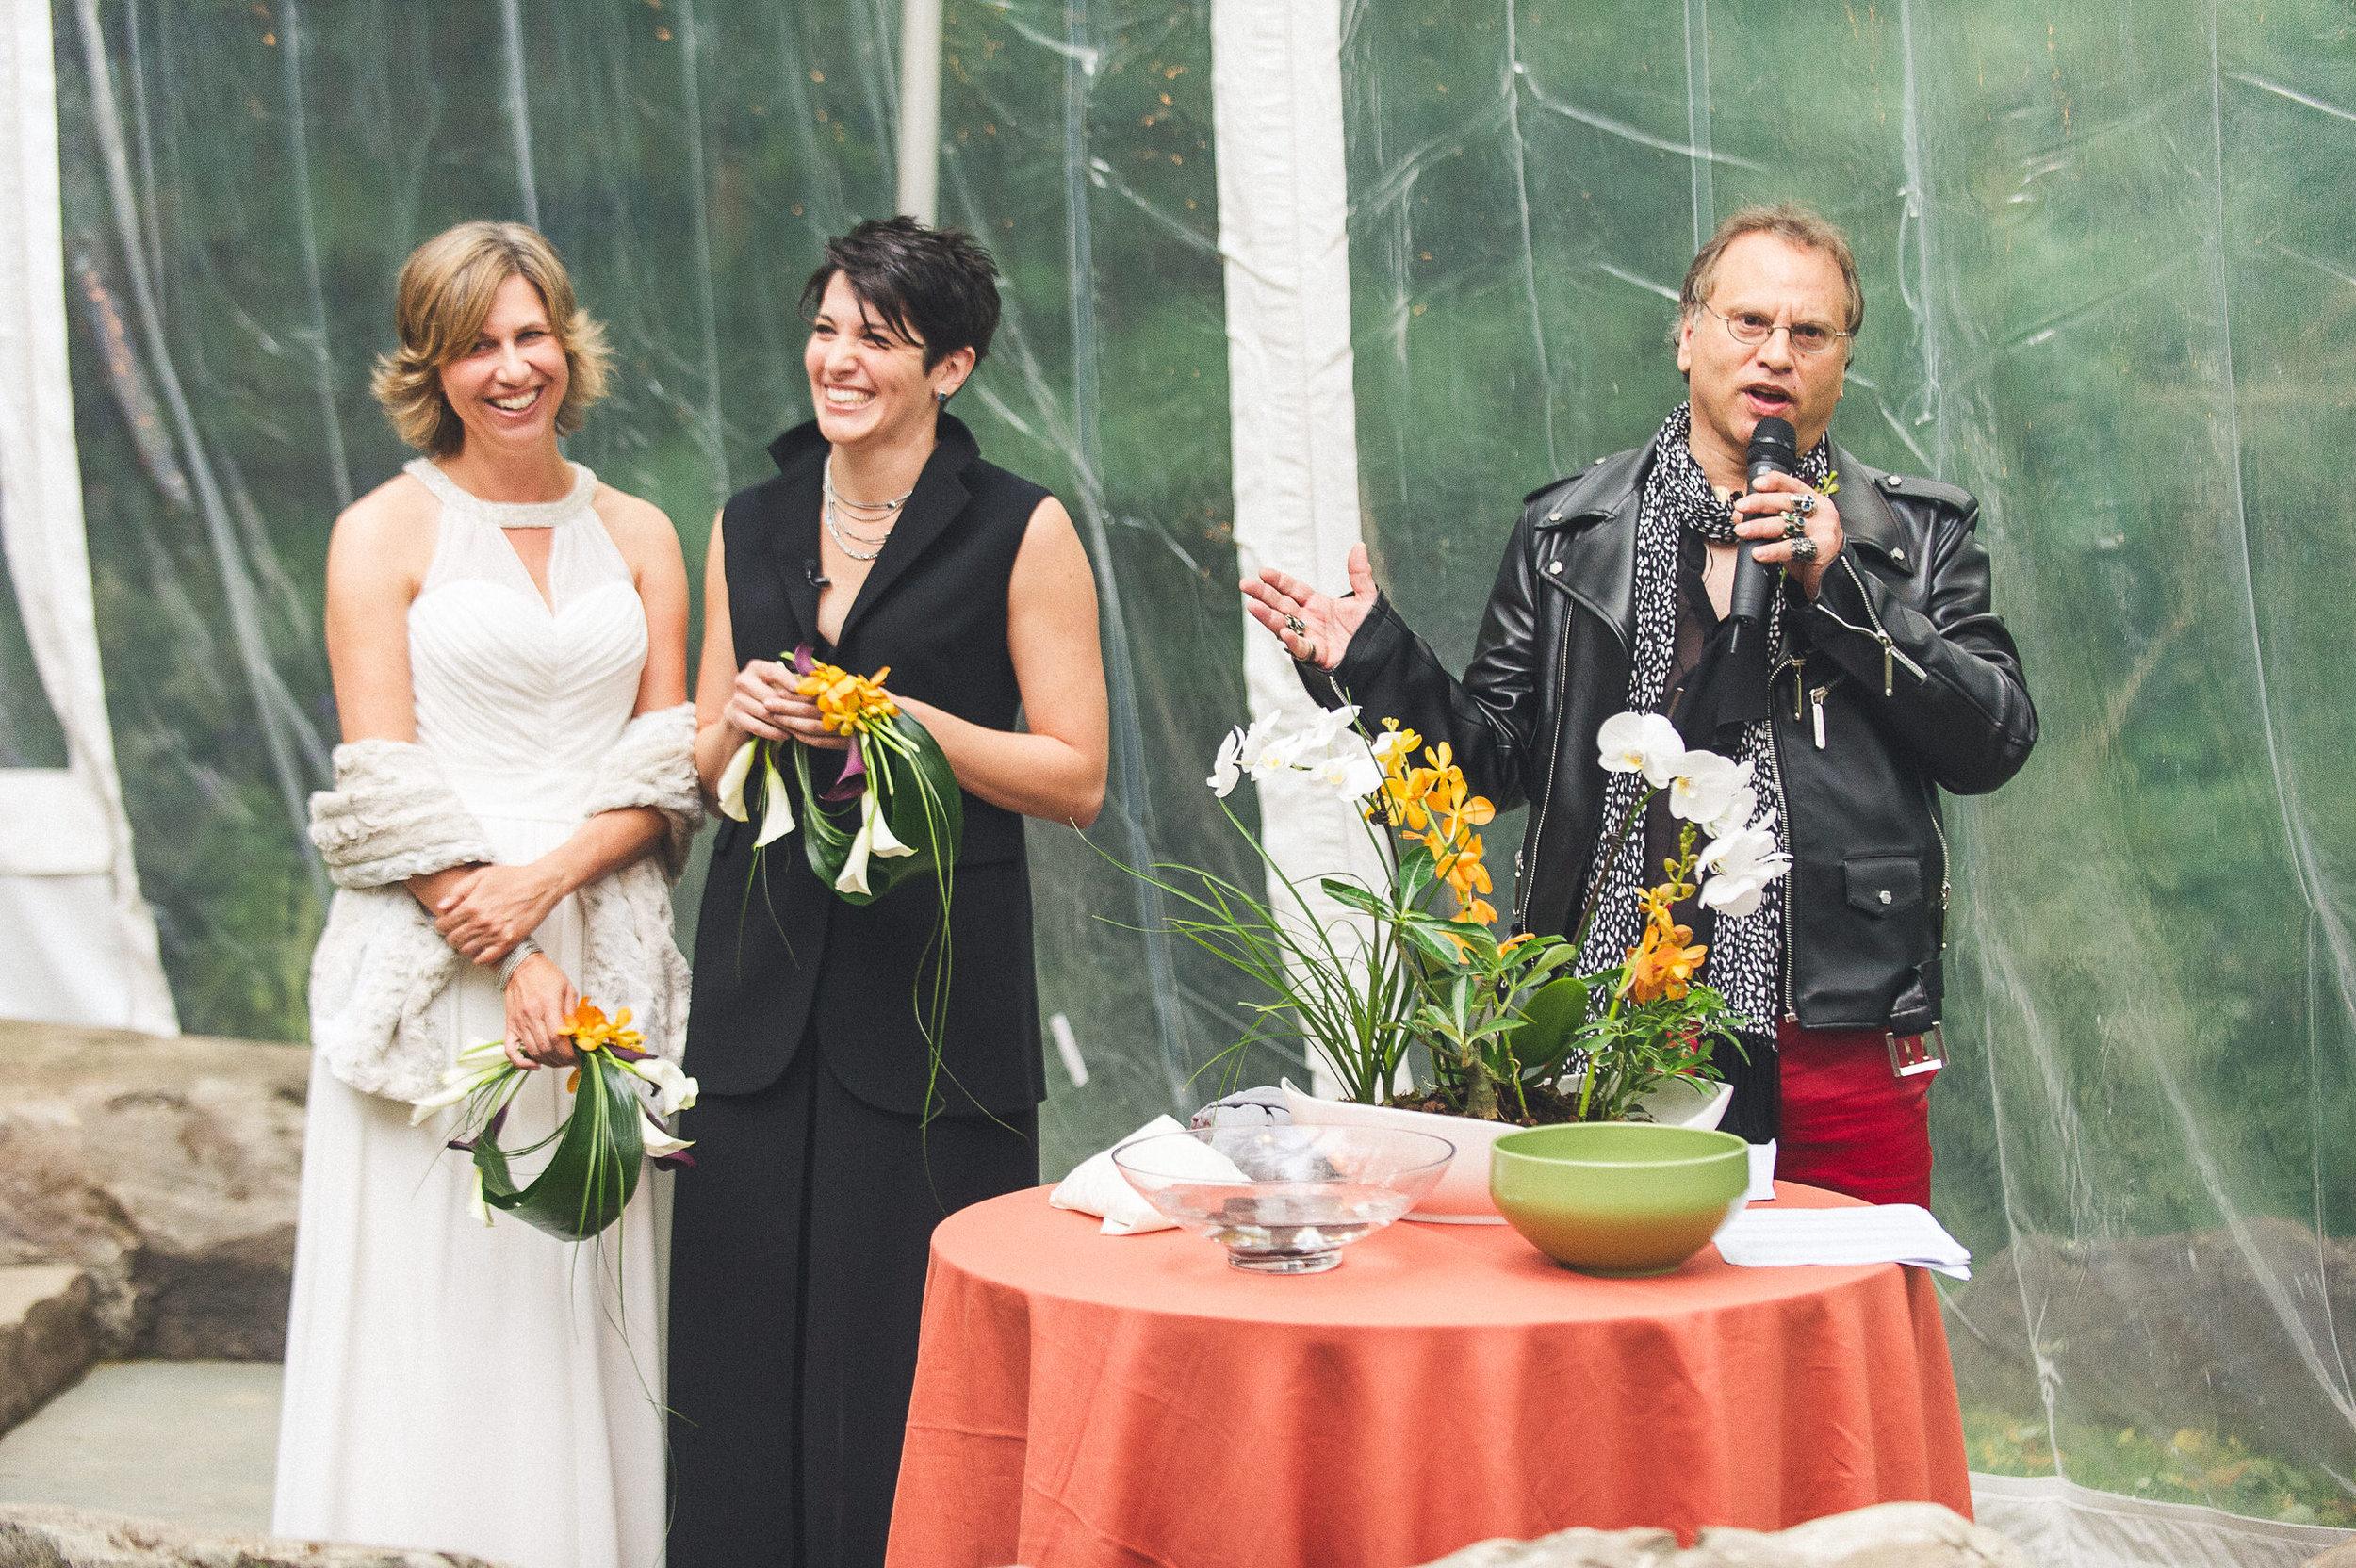 17 Philadelphia Wedding At Home Wedding Clear Tent Ceremony.jpg